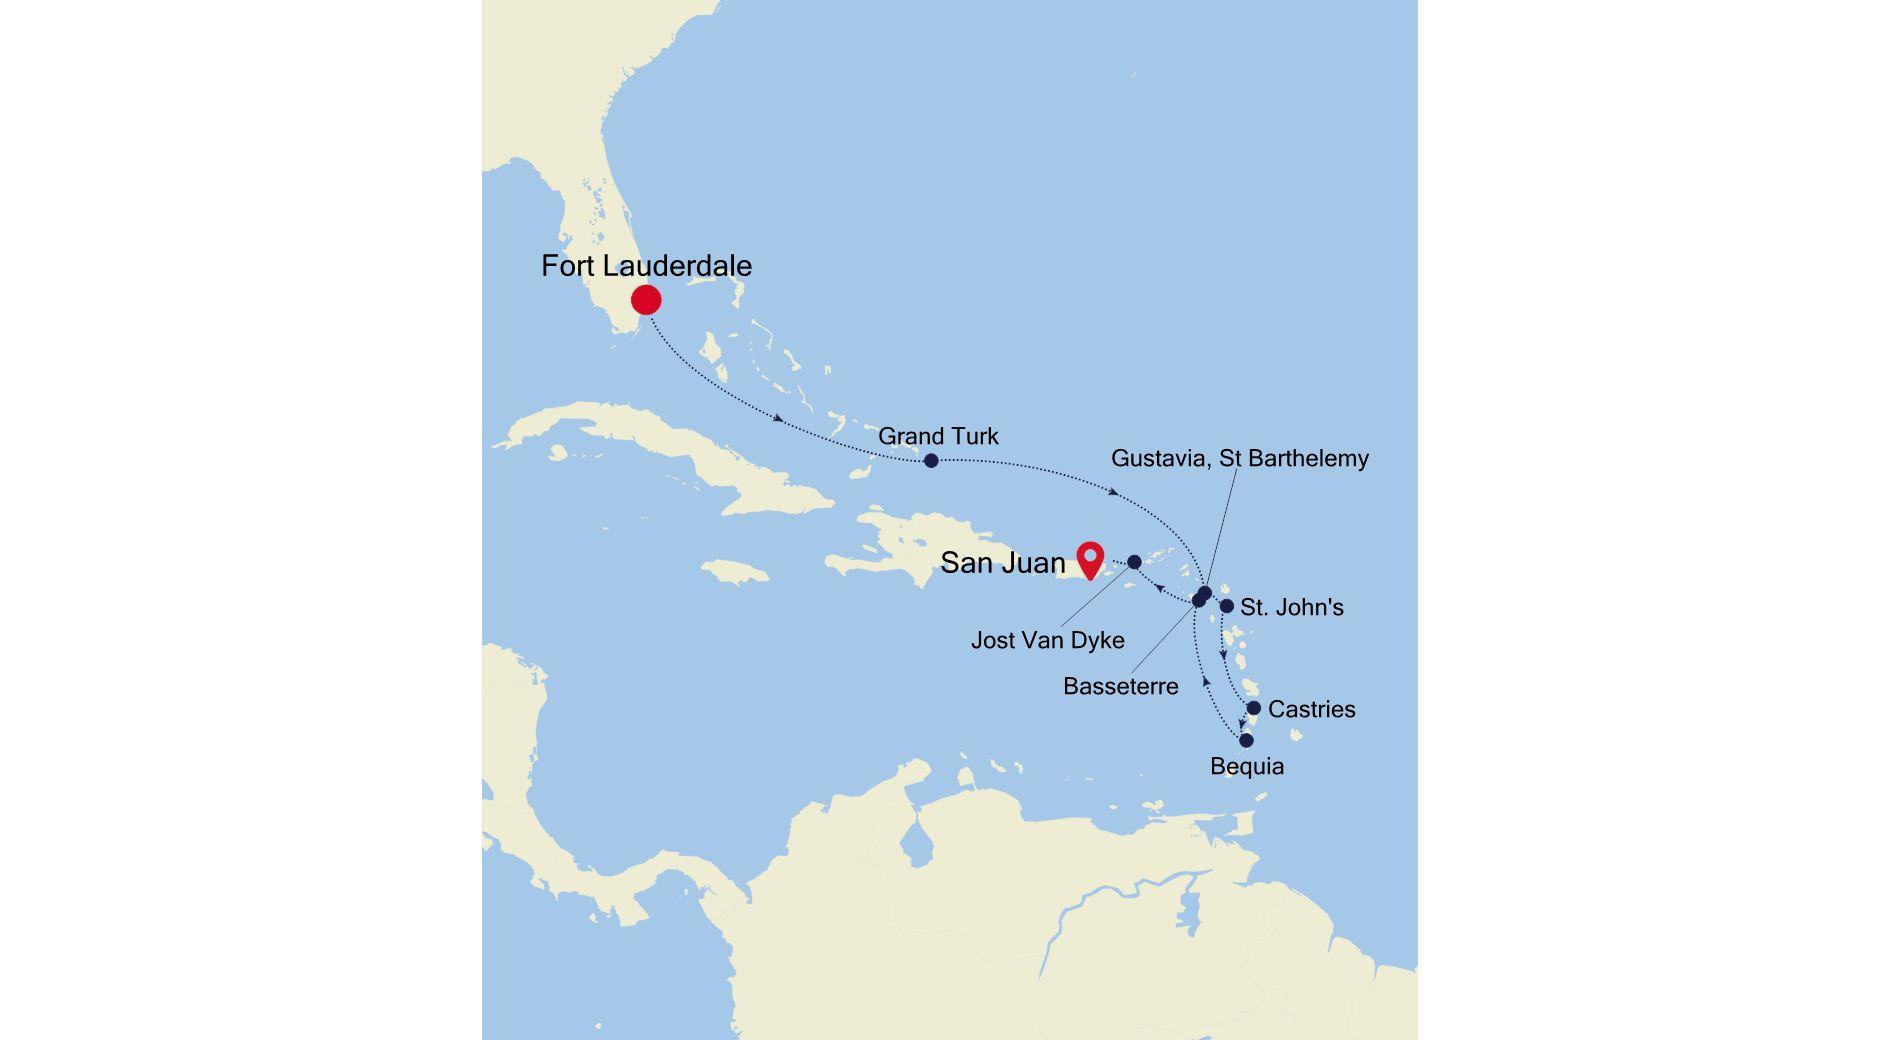 SS210129010 - Fort Lauderdale to San Juan